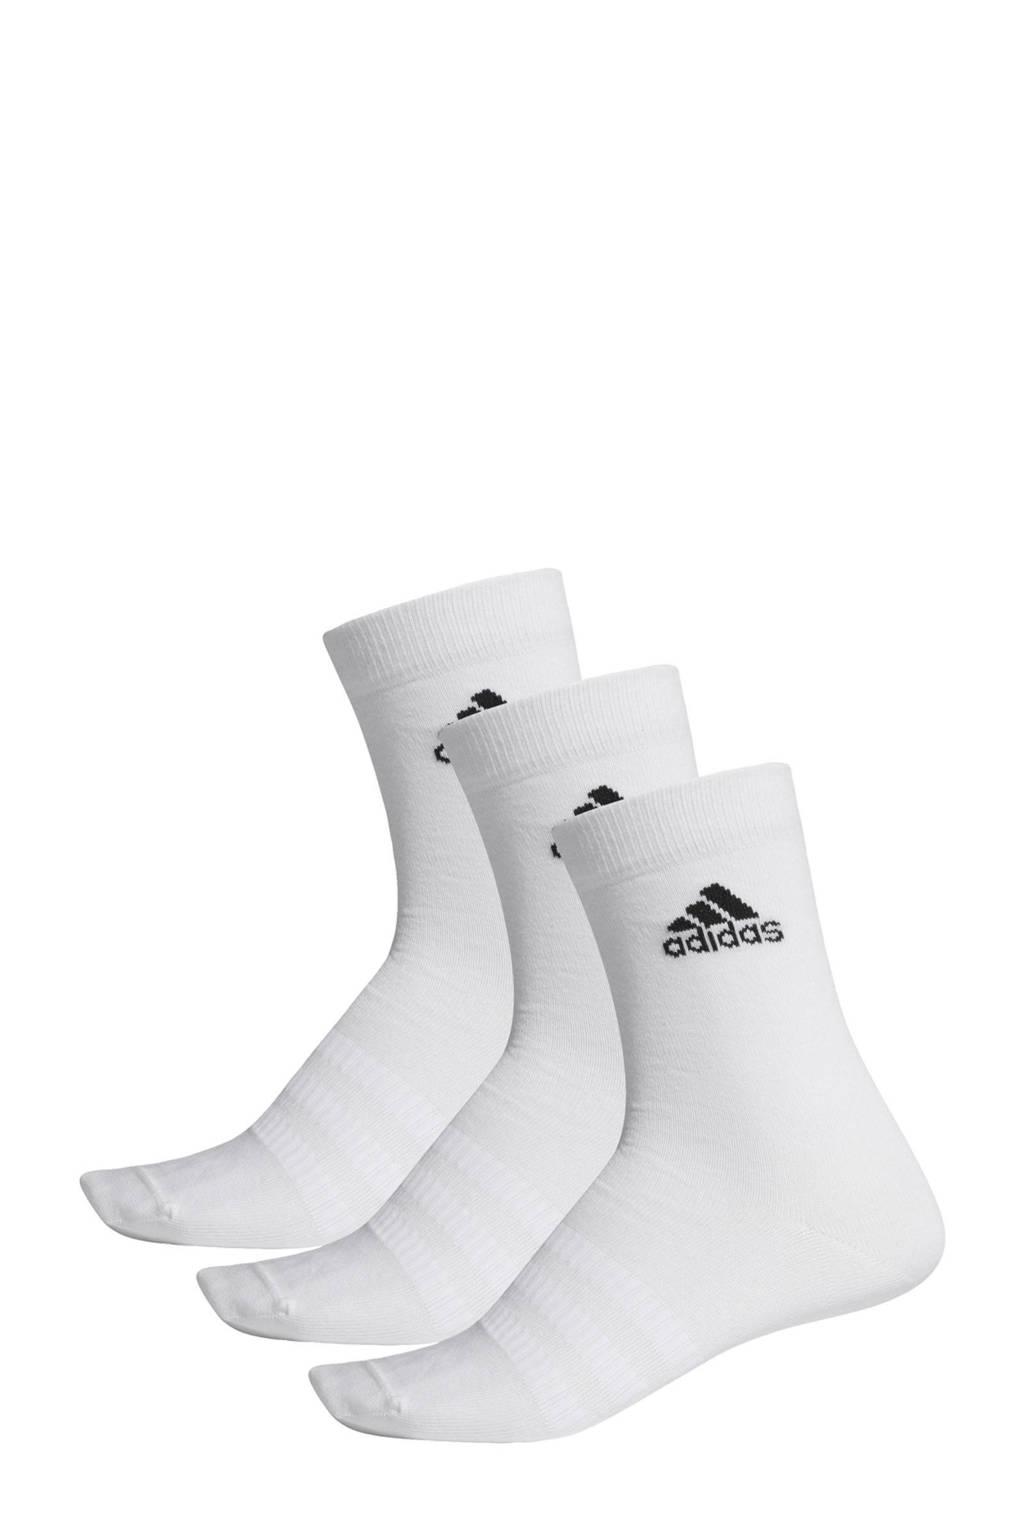 adidas   sportsokken (set van 3) wit, Wit